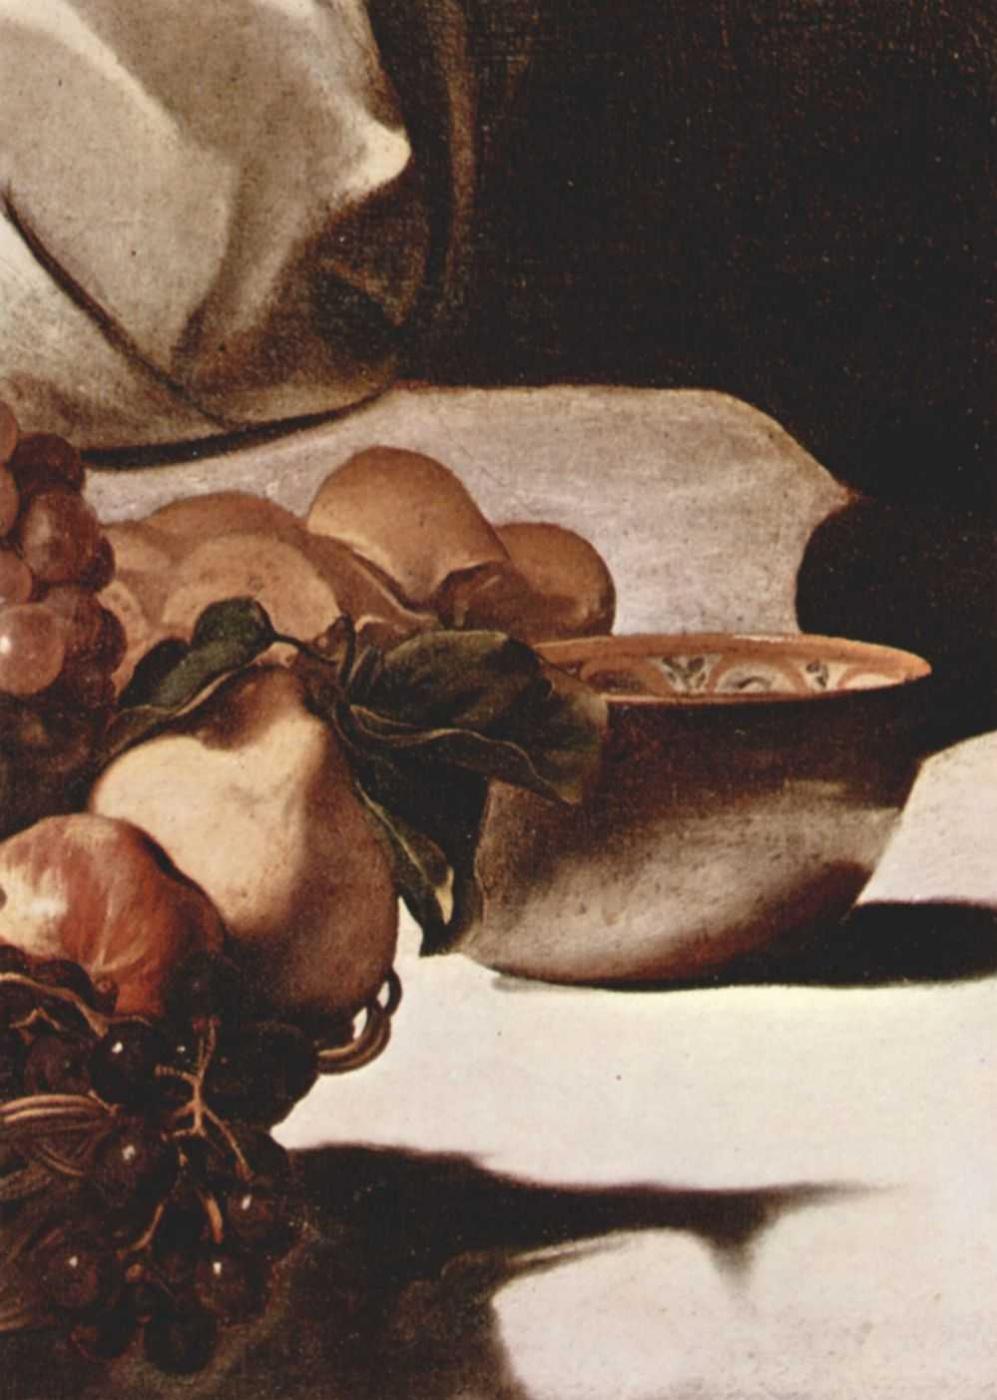 Michelangelo Merisi de Caravaggio. The supper at Emmaus. Fragment